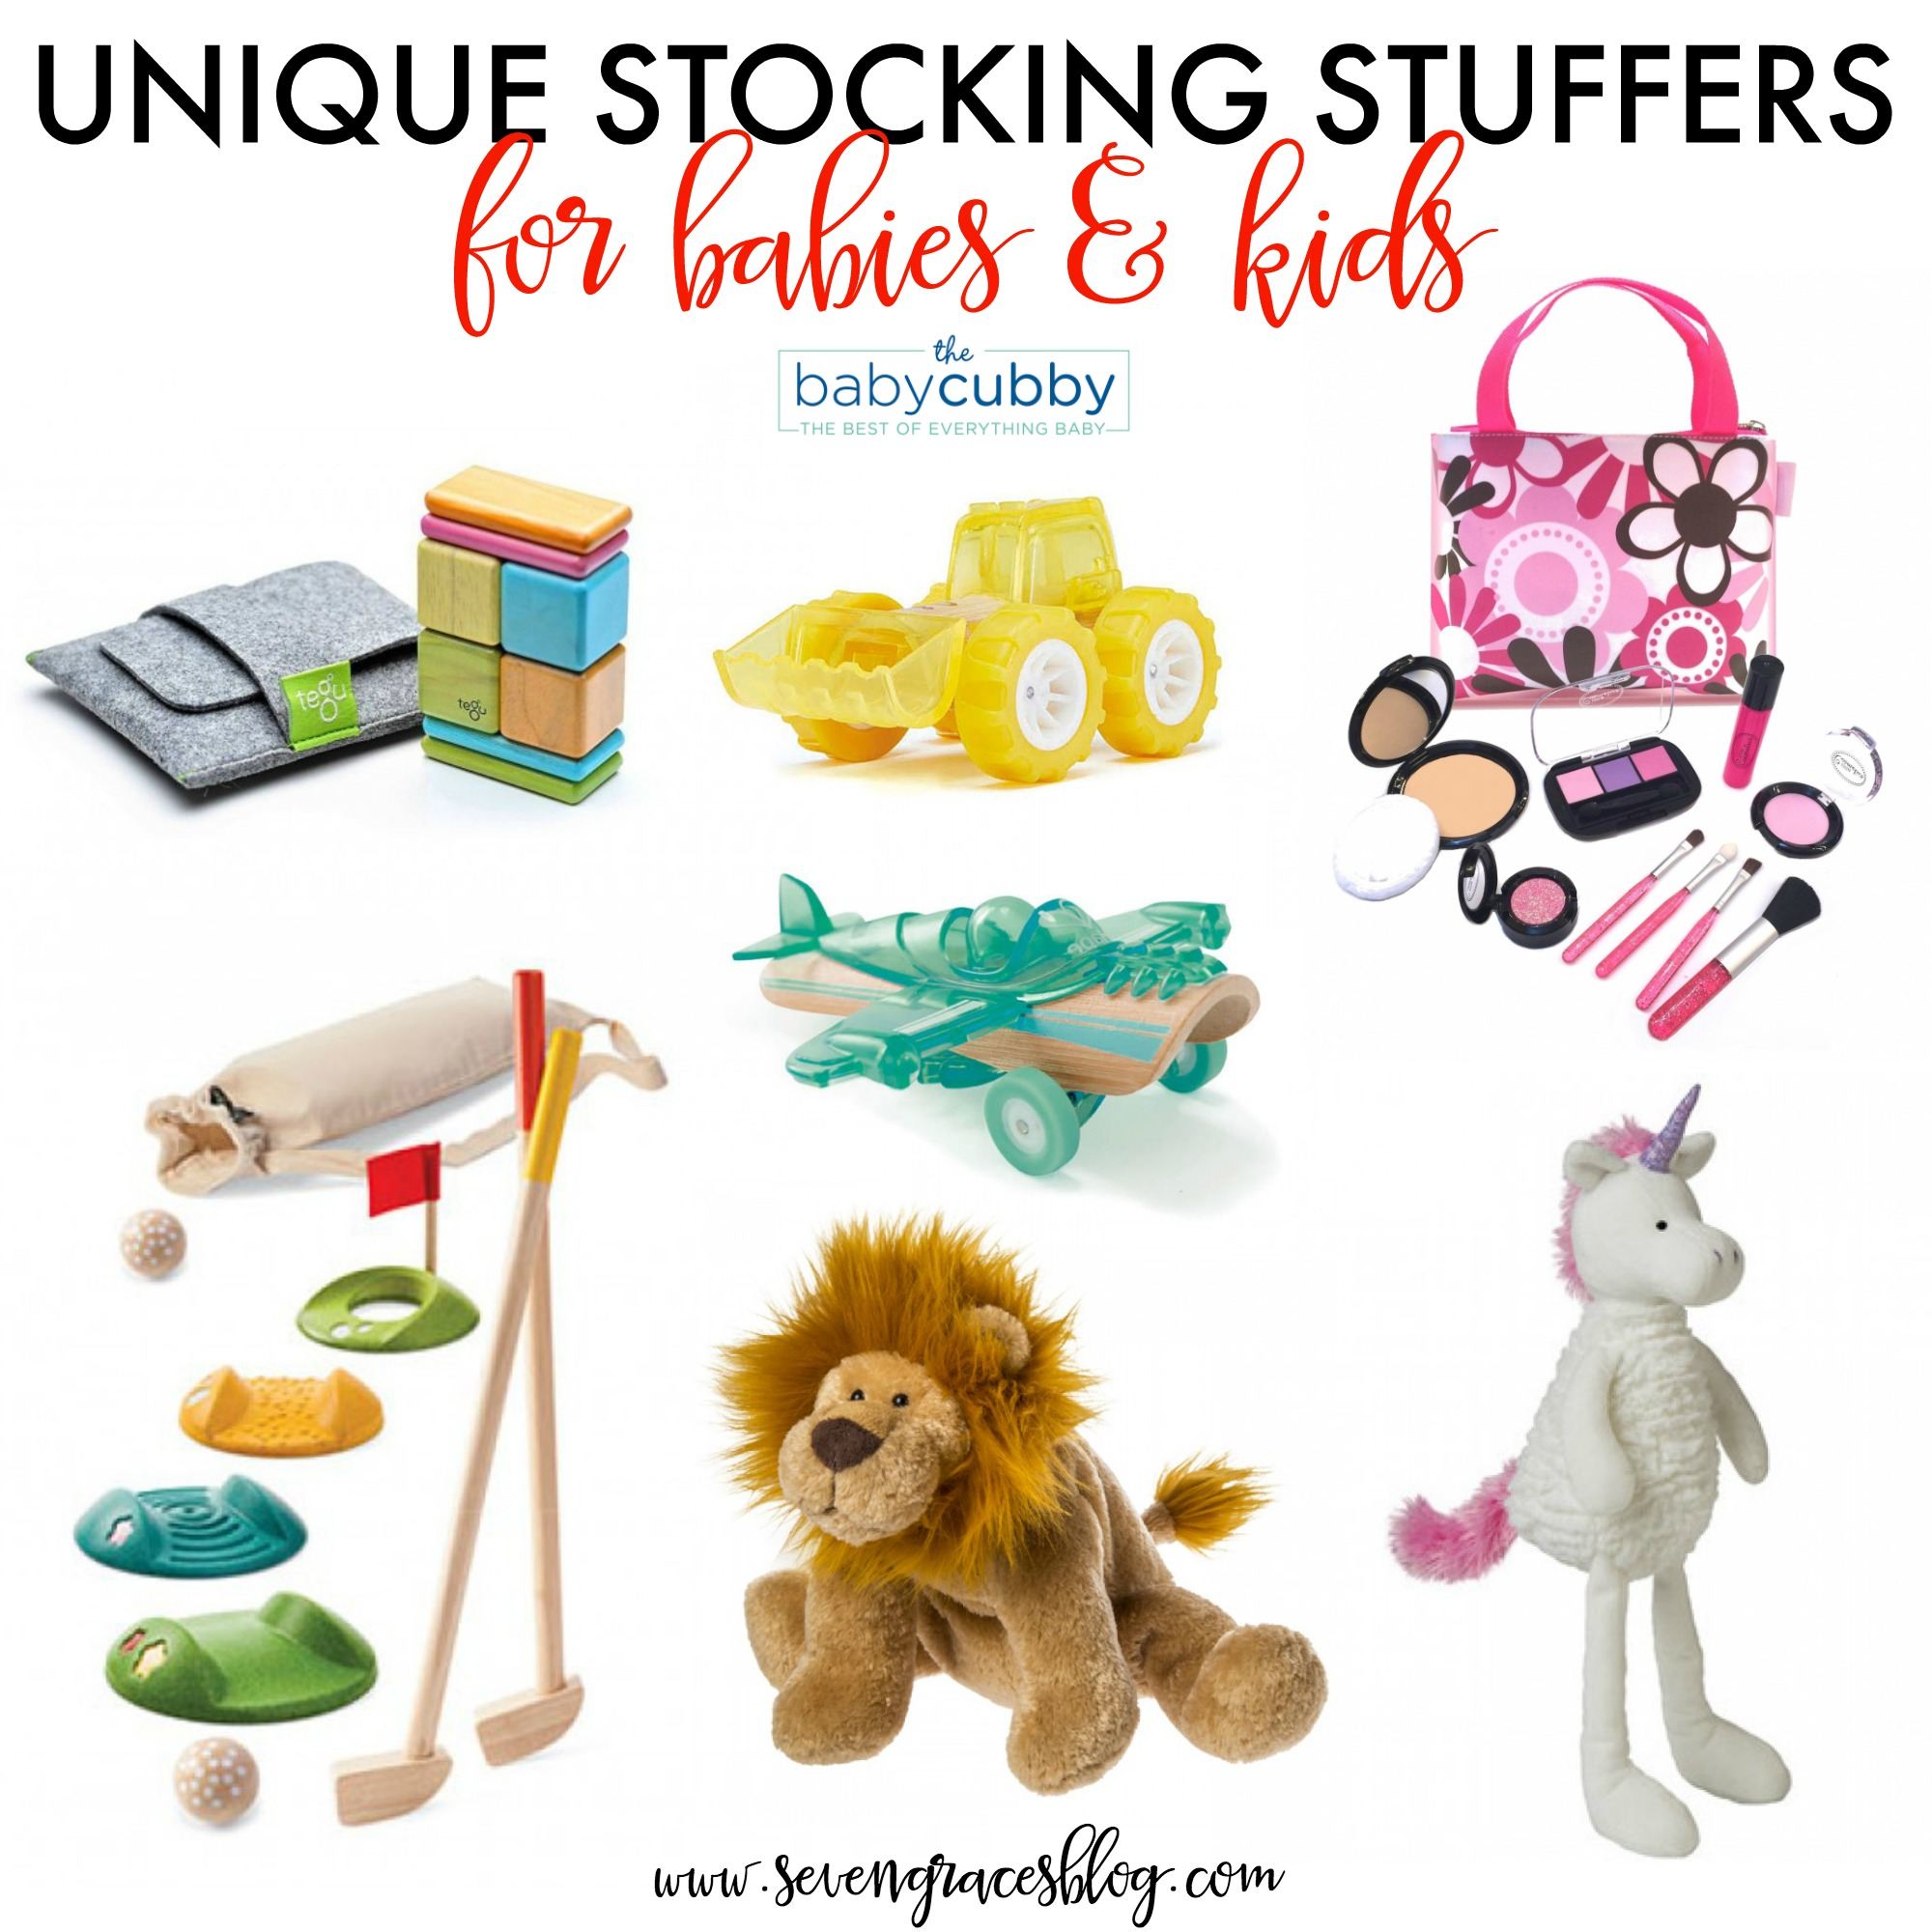 Friday Favorites Unique Stocking Stuffers Edition